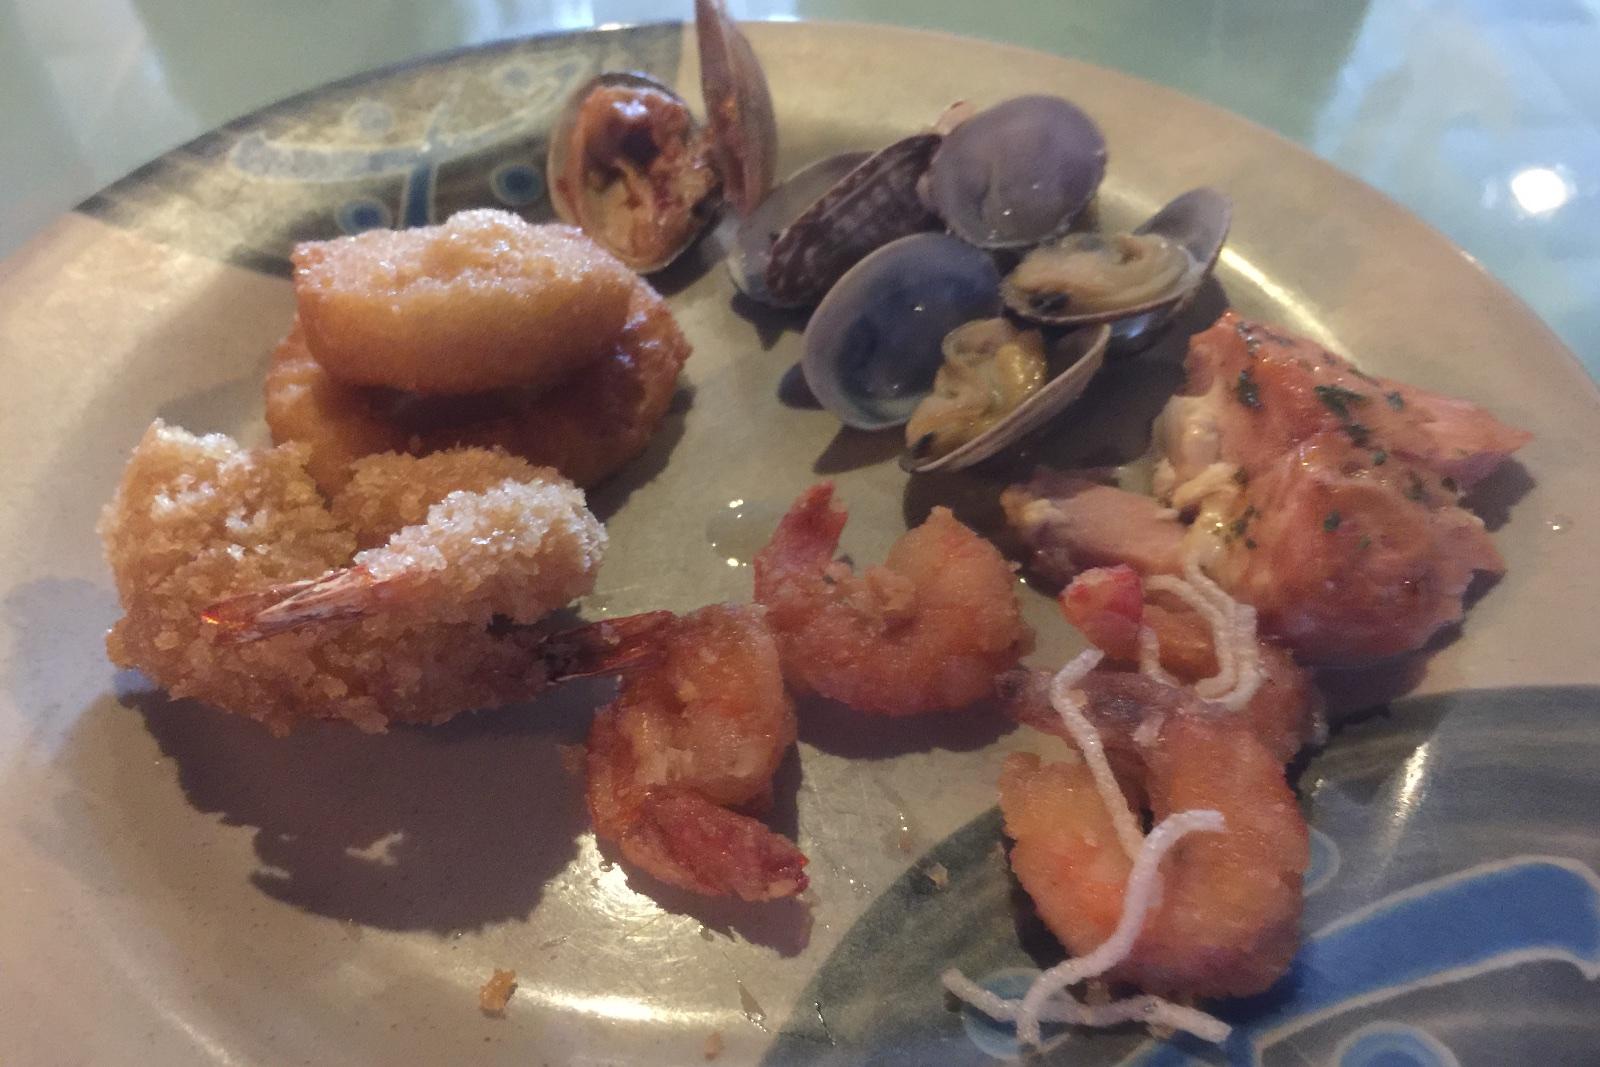 http://blog.rickk.com/food/2016/07/24/ate.2016.07.24.d2.jpg